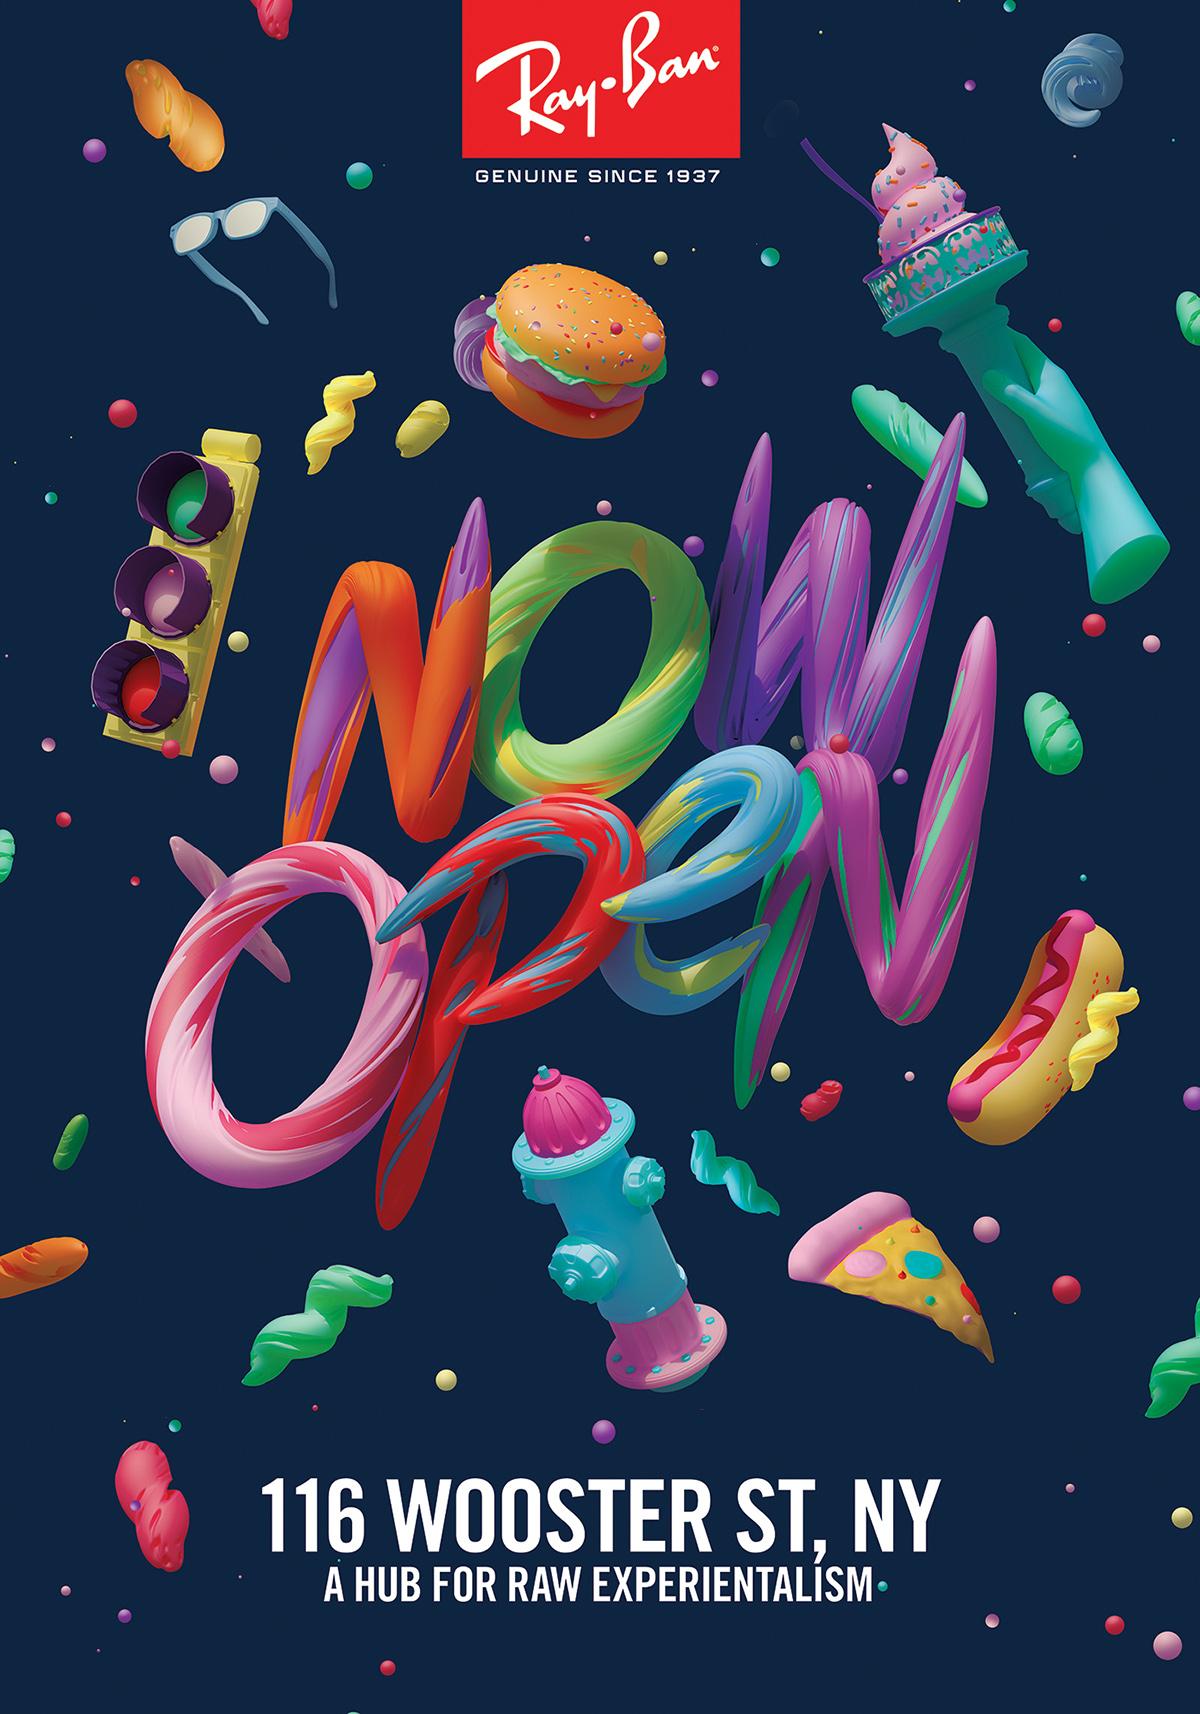 nyc New York burger Sunglasses hot dog fire hyrdant soho Candy cinema4d Pizza Window Display